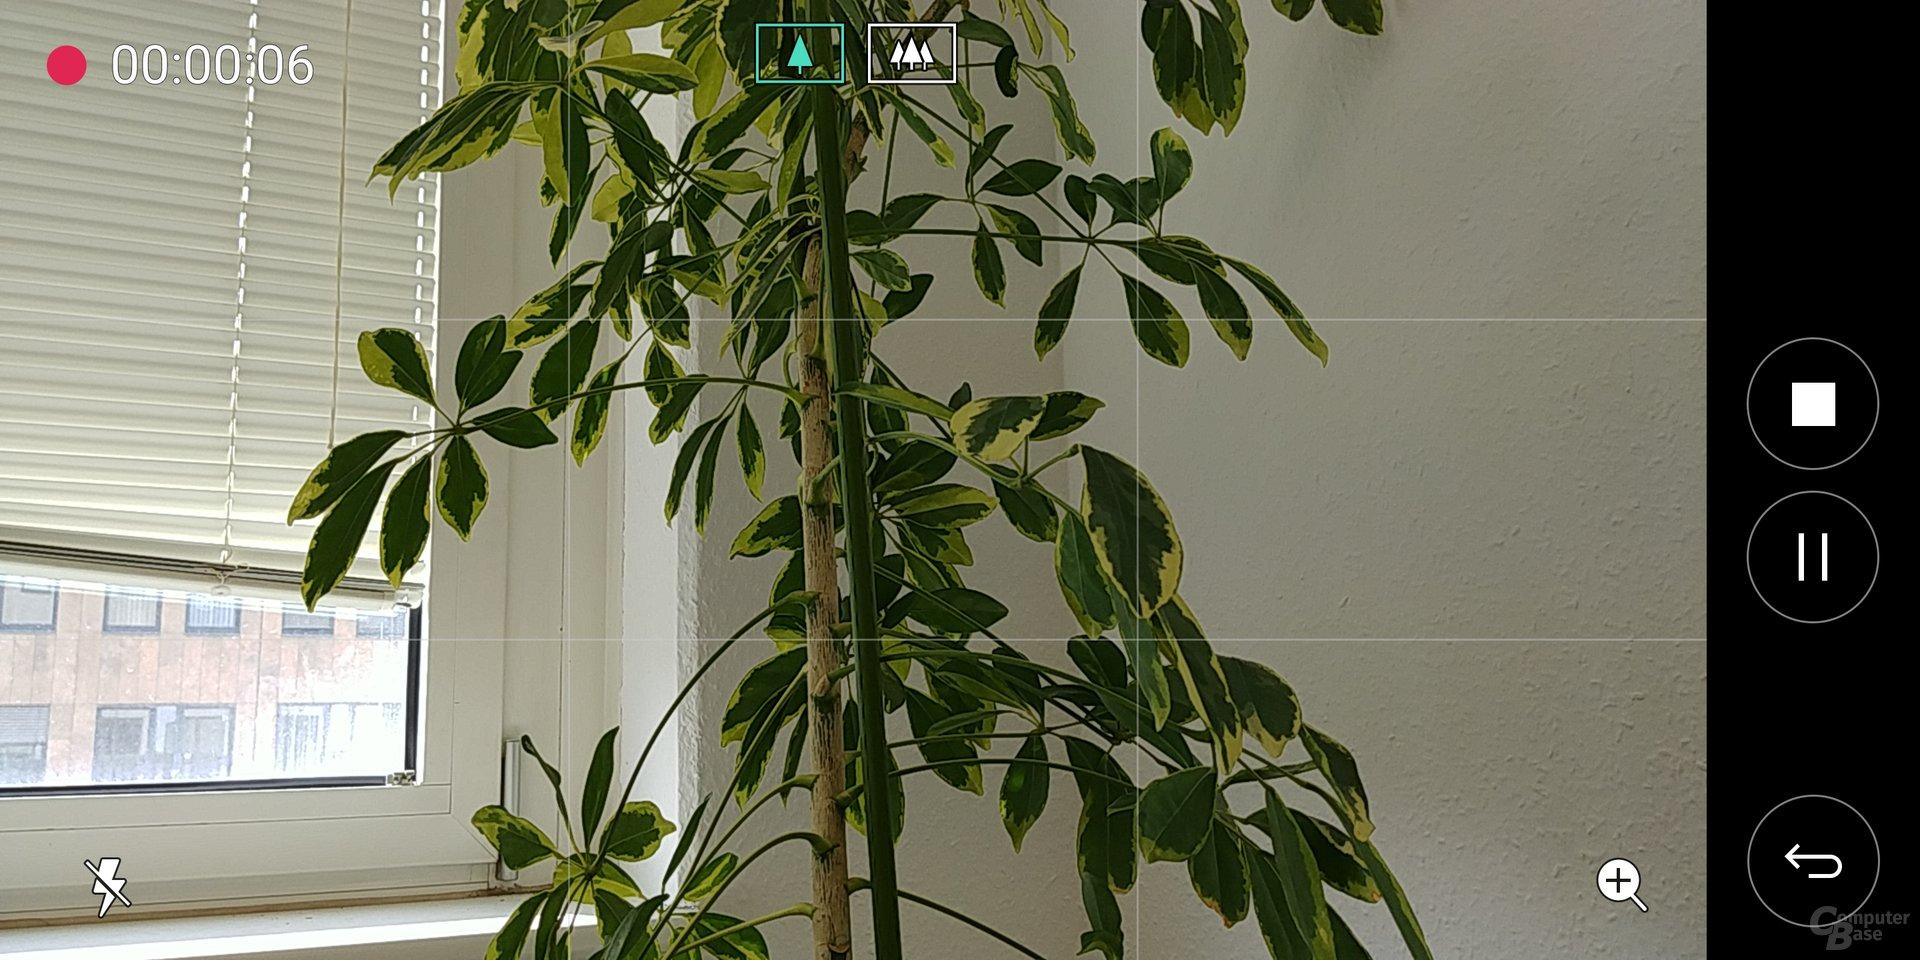 Kamera-App des LG G6 im Videomodus